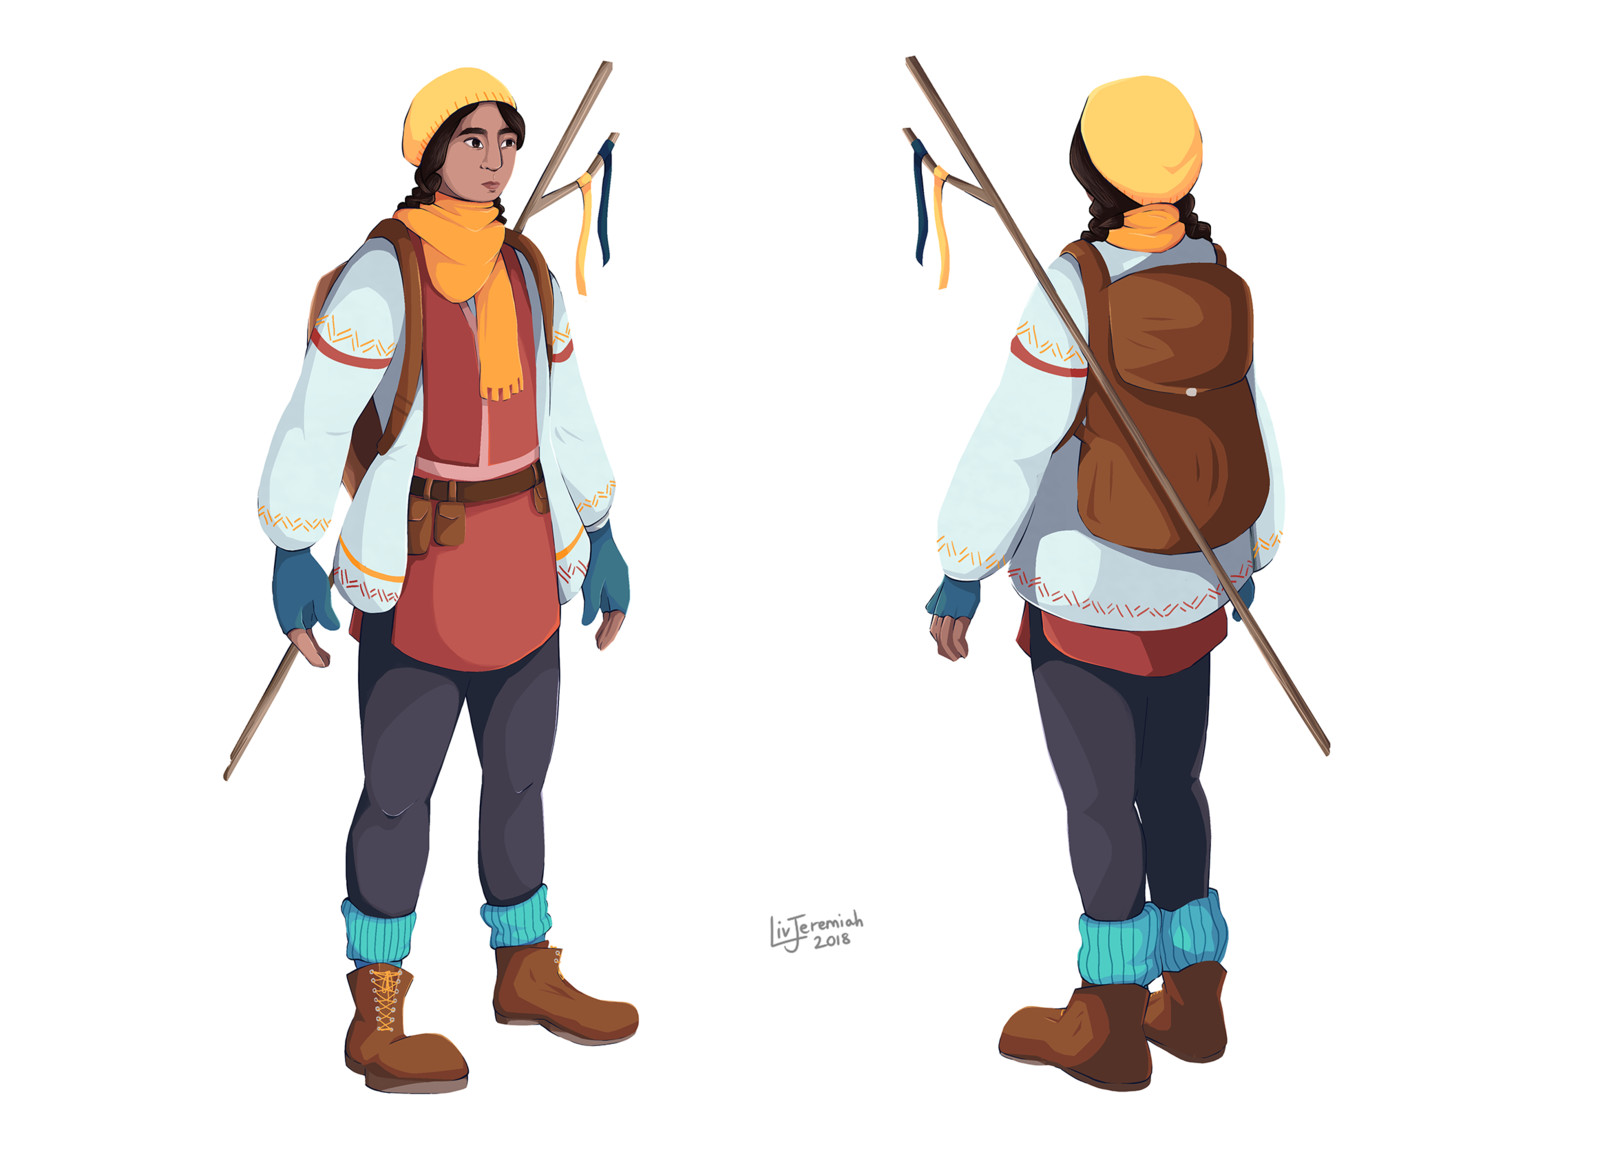 Nanu - Character turnaround